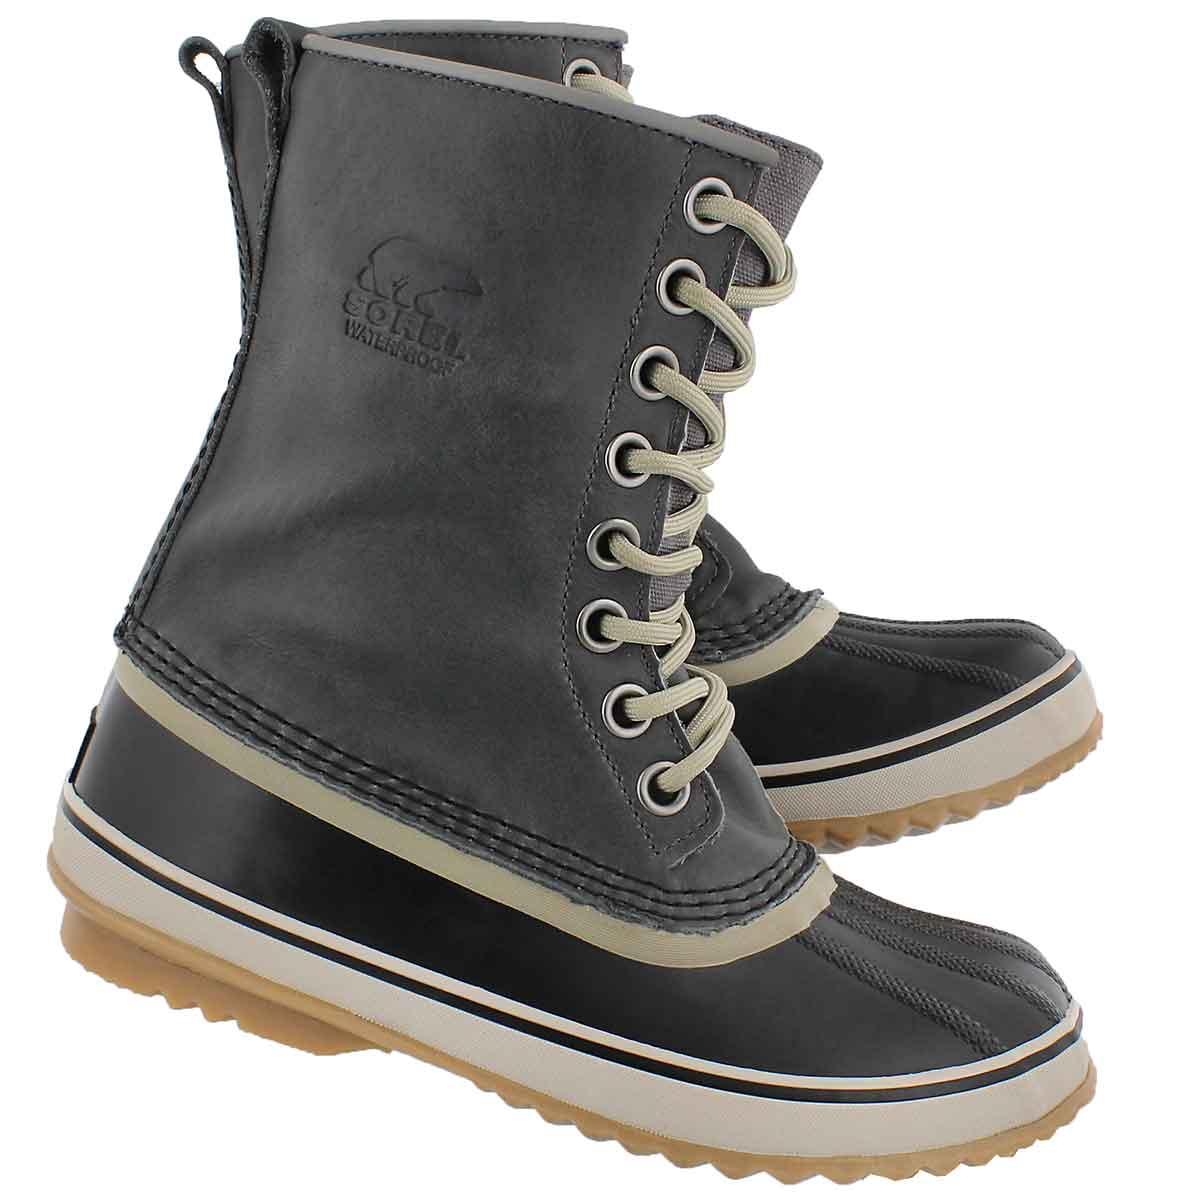 Lds 1964 Premium LTR quarry winter boot